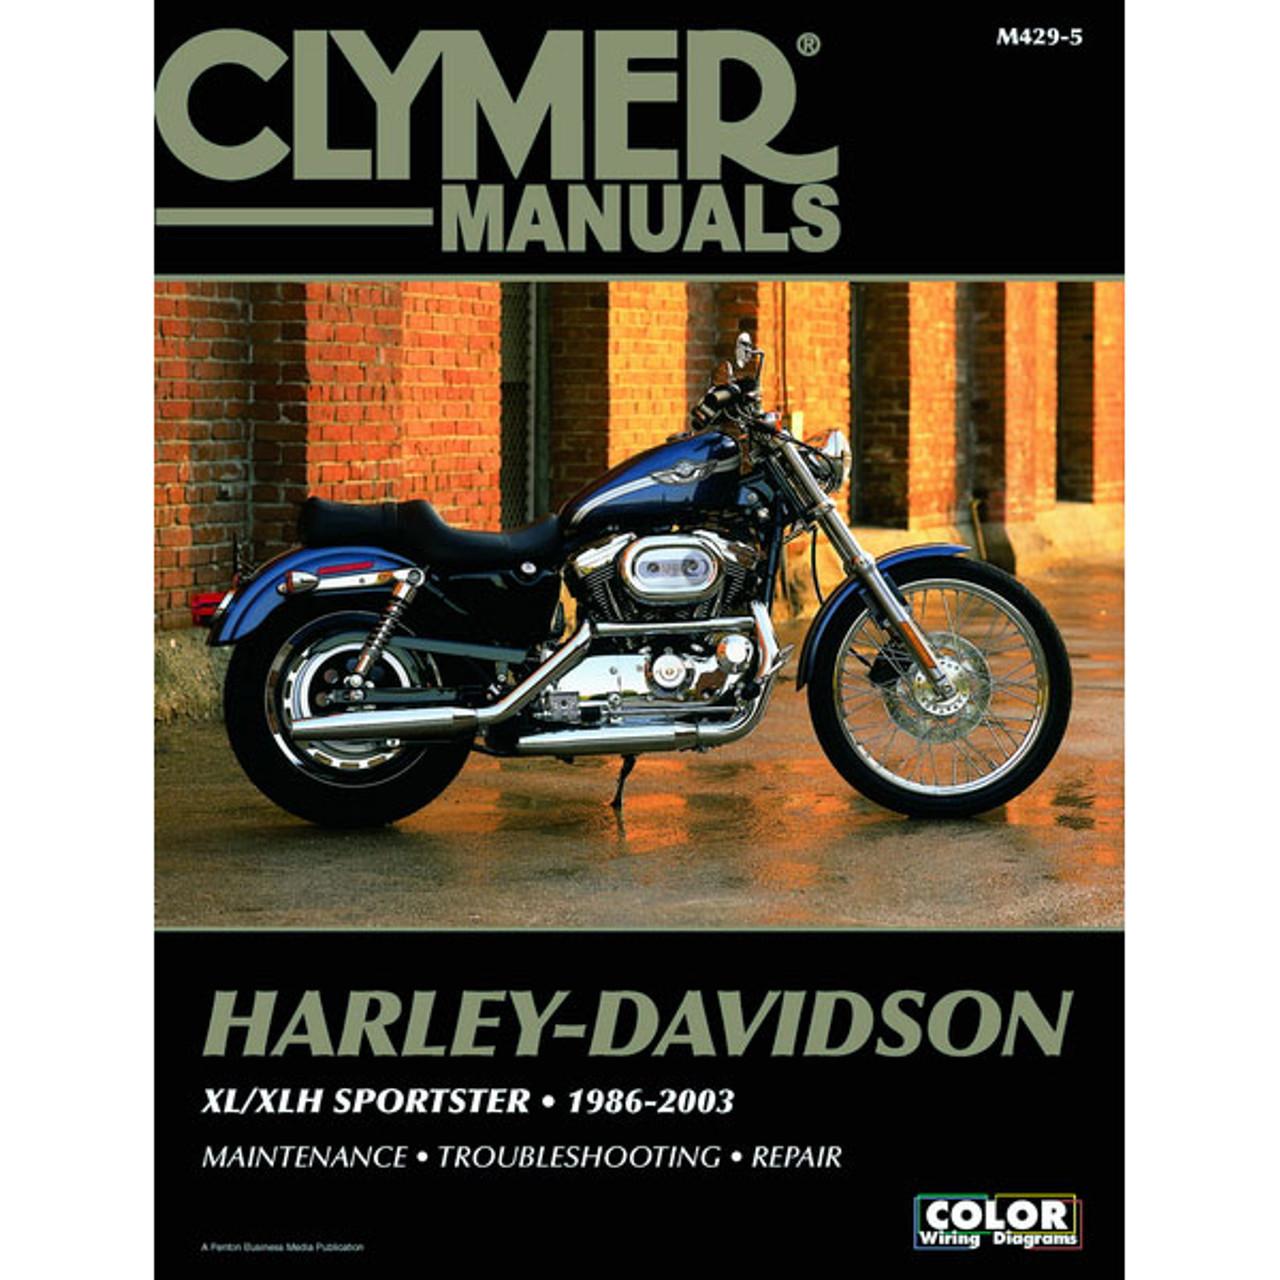 Clymer Harley-Davidson XL/XLH Sportster 86-03 Service Manual on